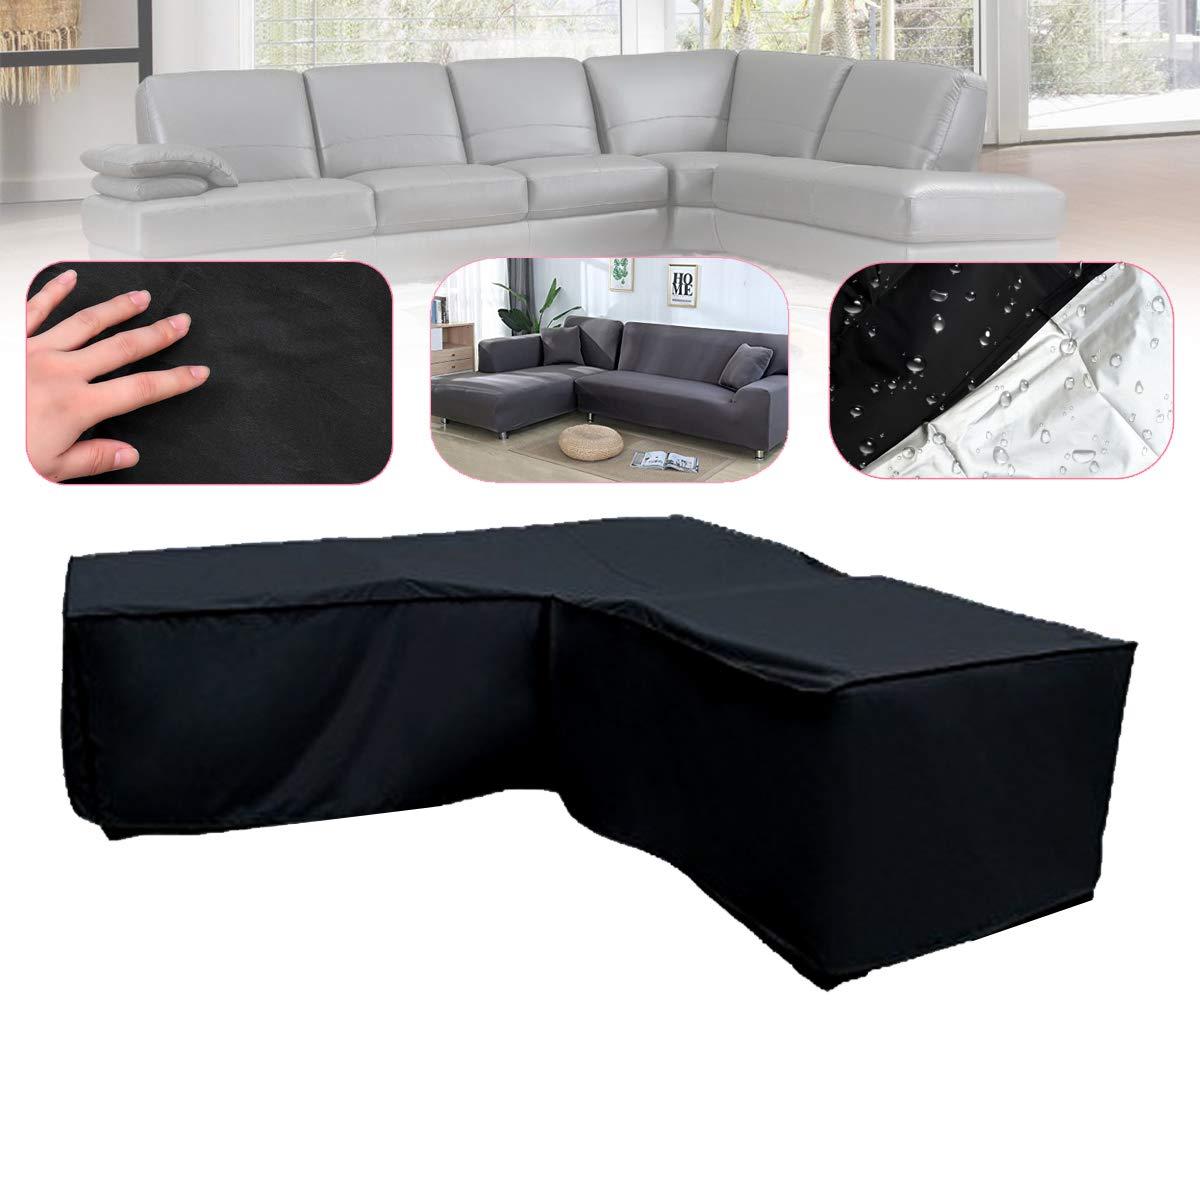 SONSAN L Shape Black Sofa Furniture Covers Cover Bag Rattan Garden Waterproof Protector